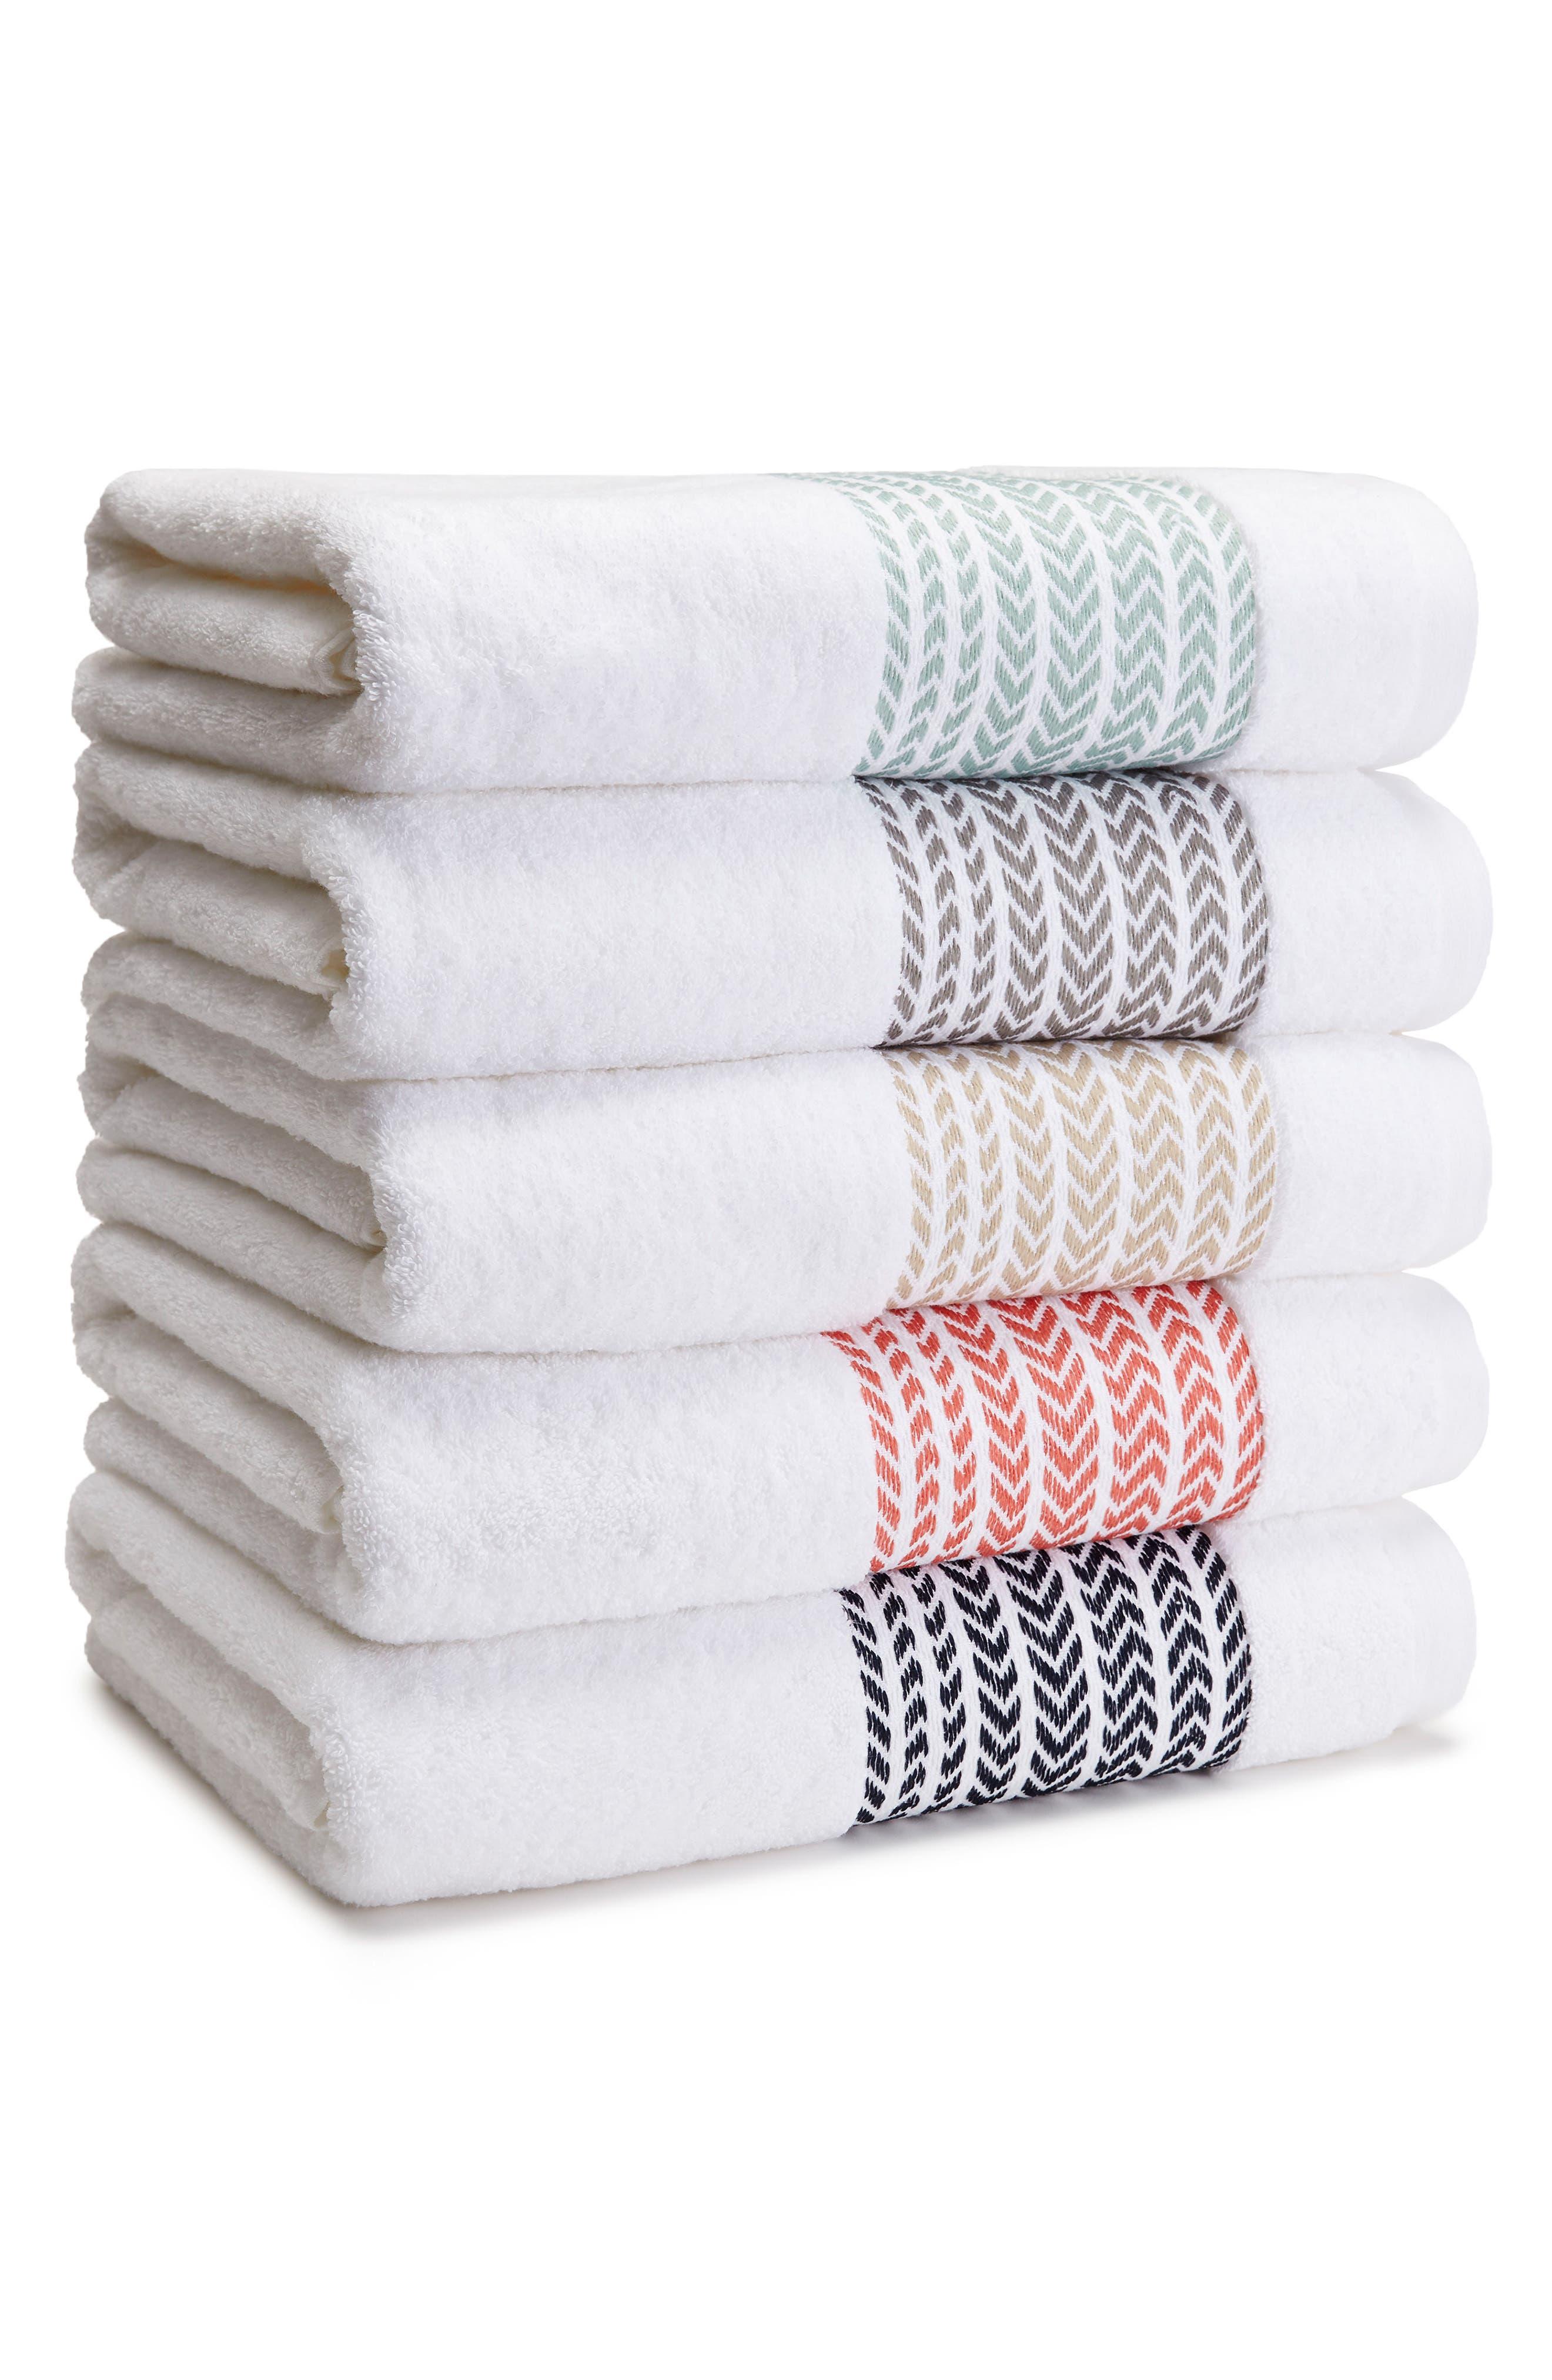 Baja Bath Towel,                             Alternate thumbnail 2, color,                             020